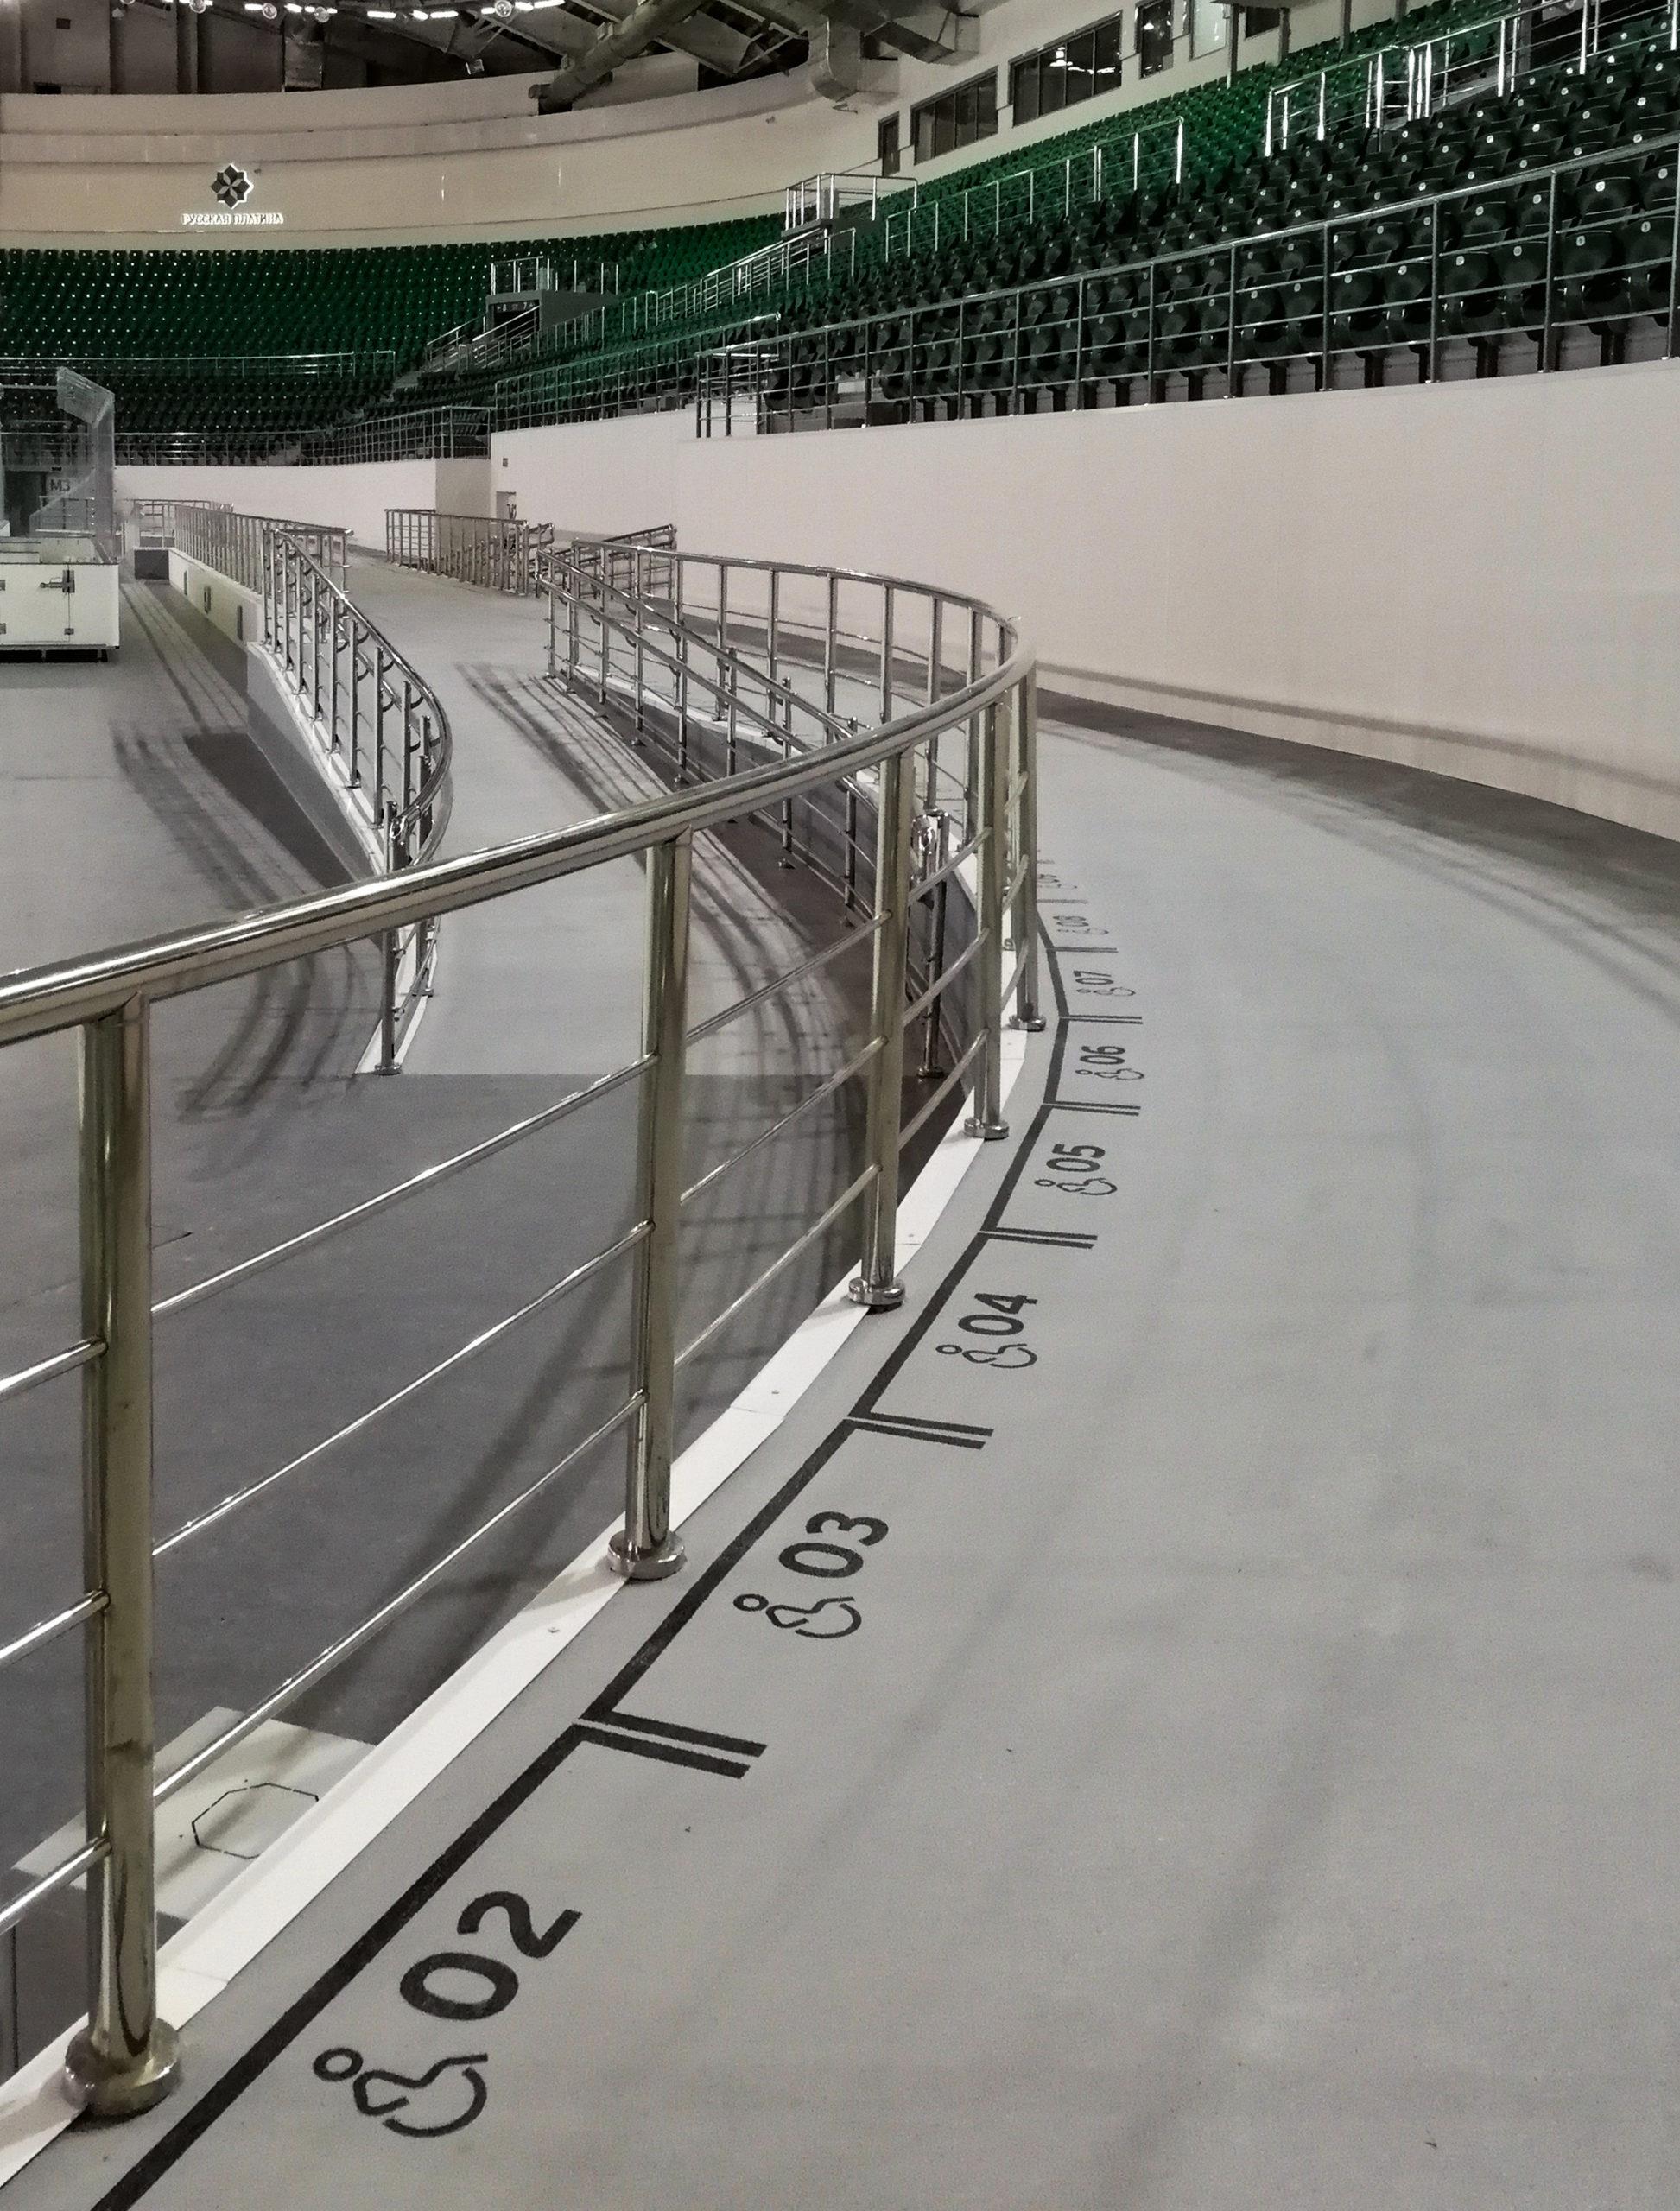 "Dav | Навигация в ледовом дворце ""Платинум Арена"""